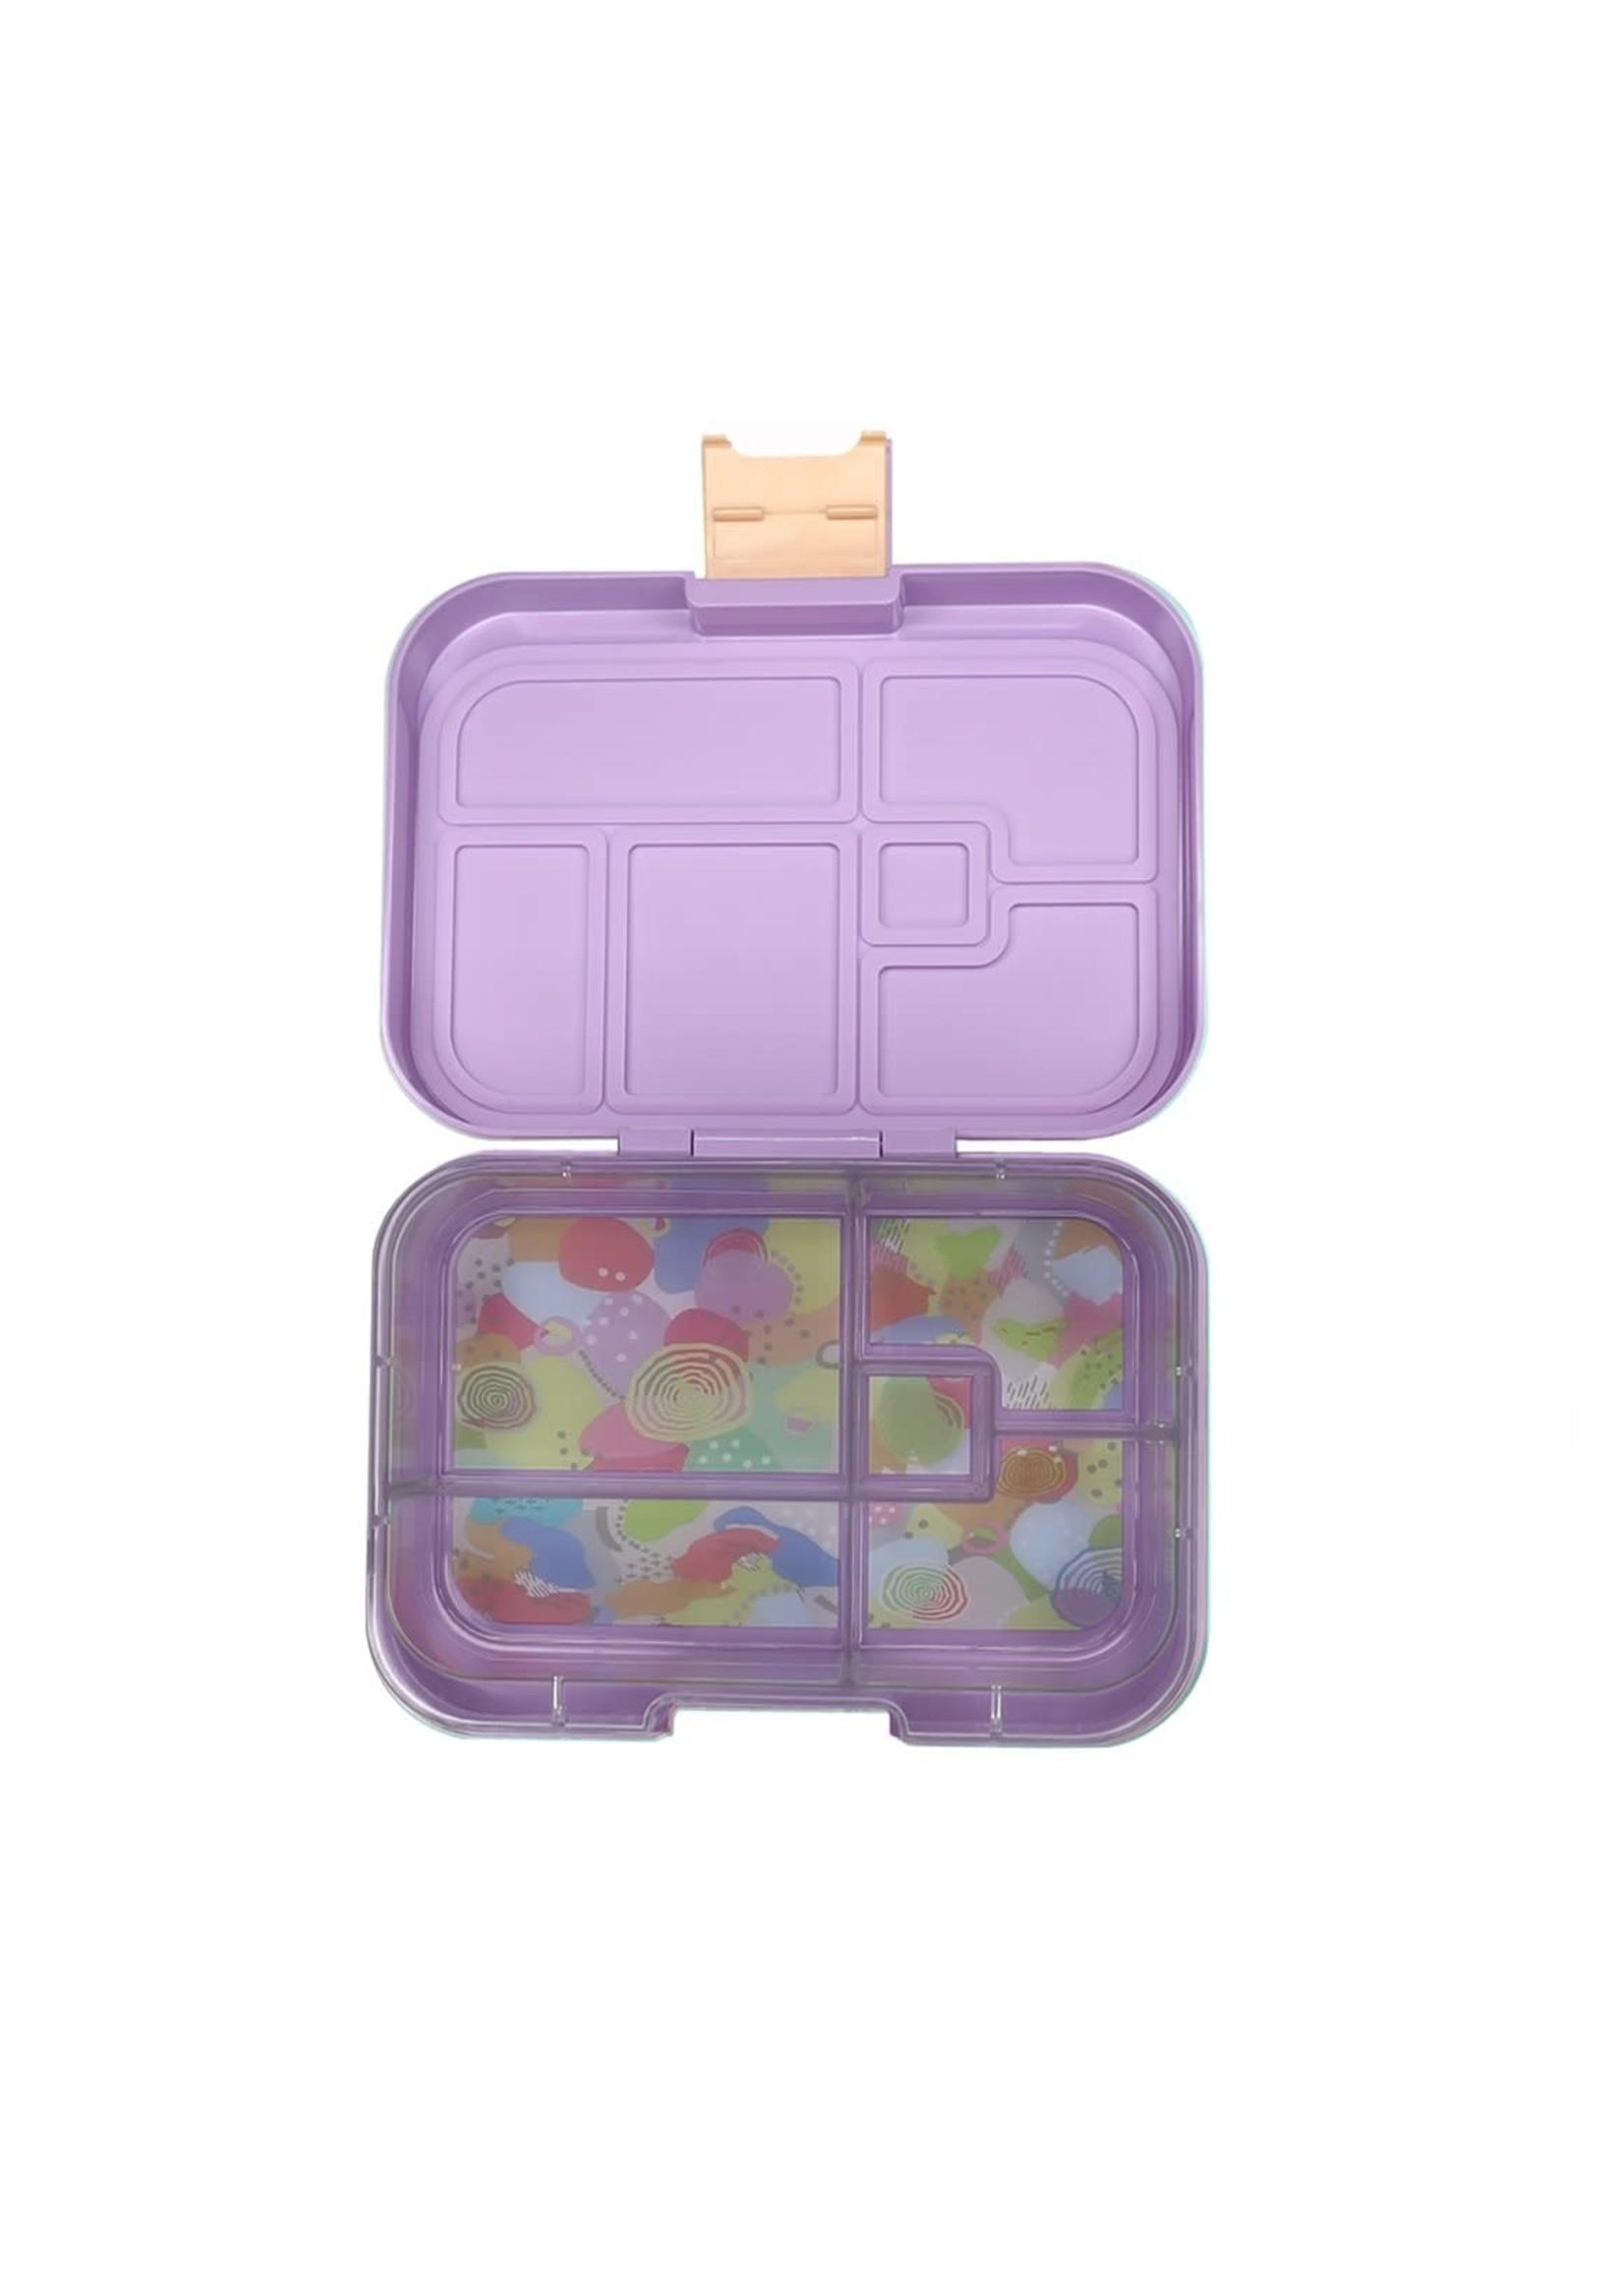 Munchbox Munchbox Midi5 (Lavender Dream)